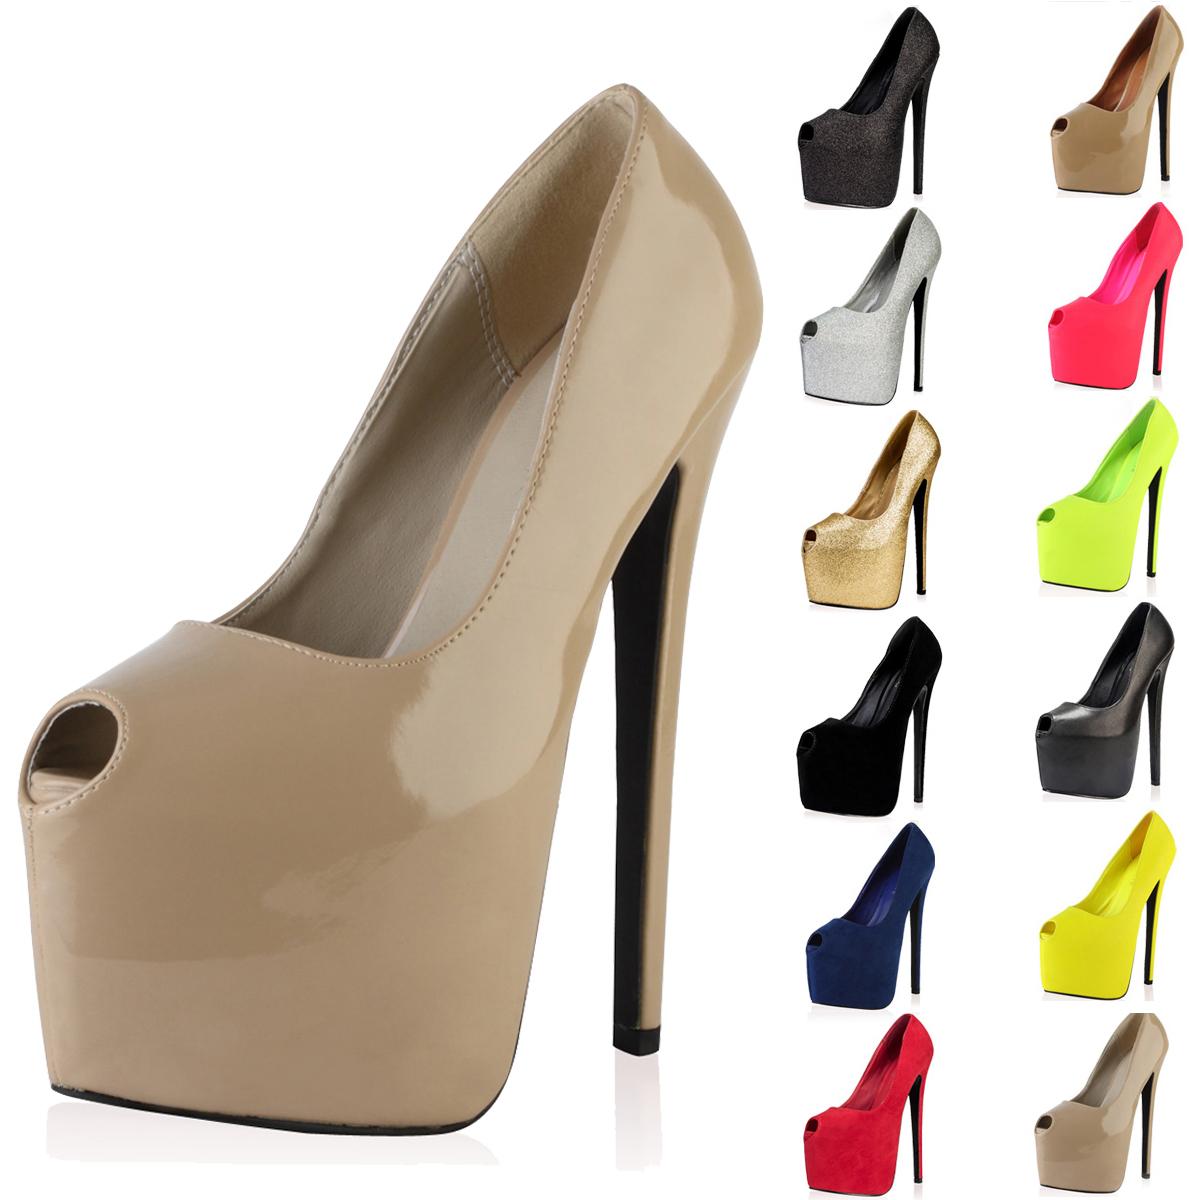 peep toe concealed platform womens 7 inch high